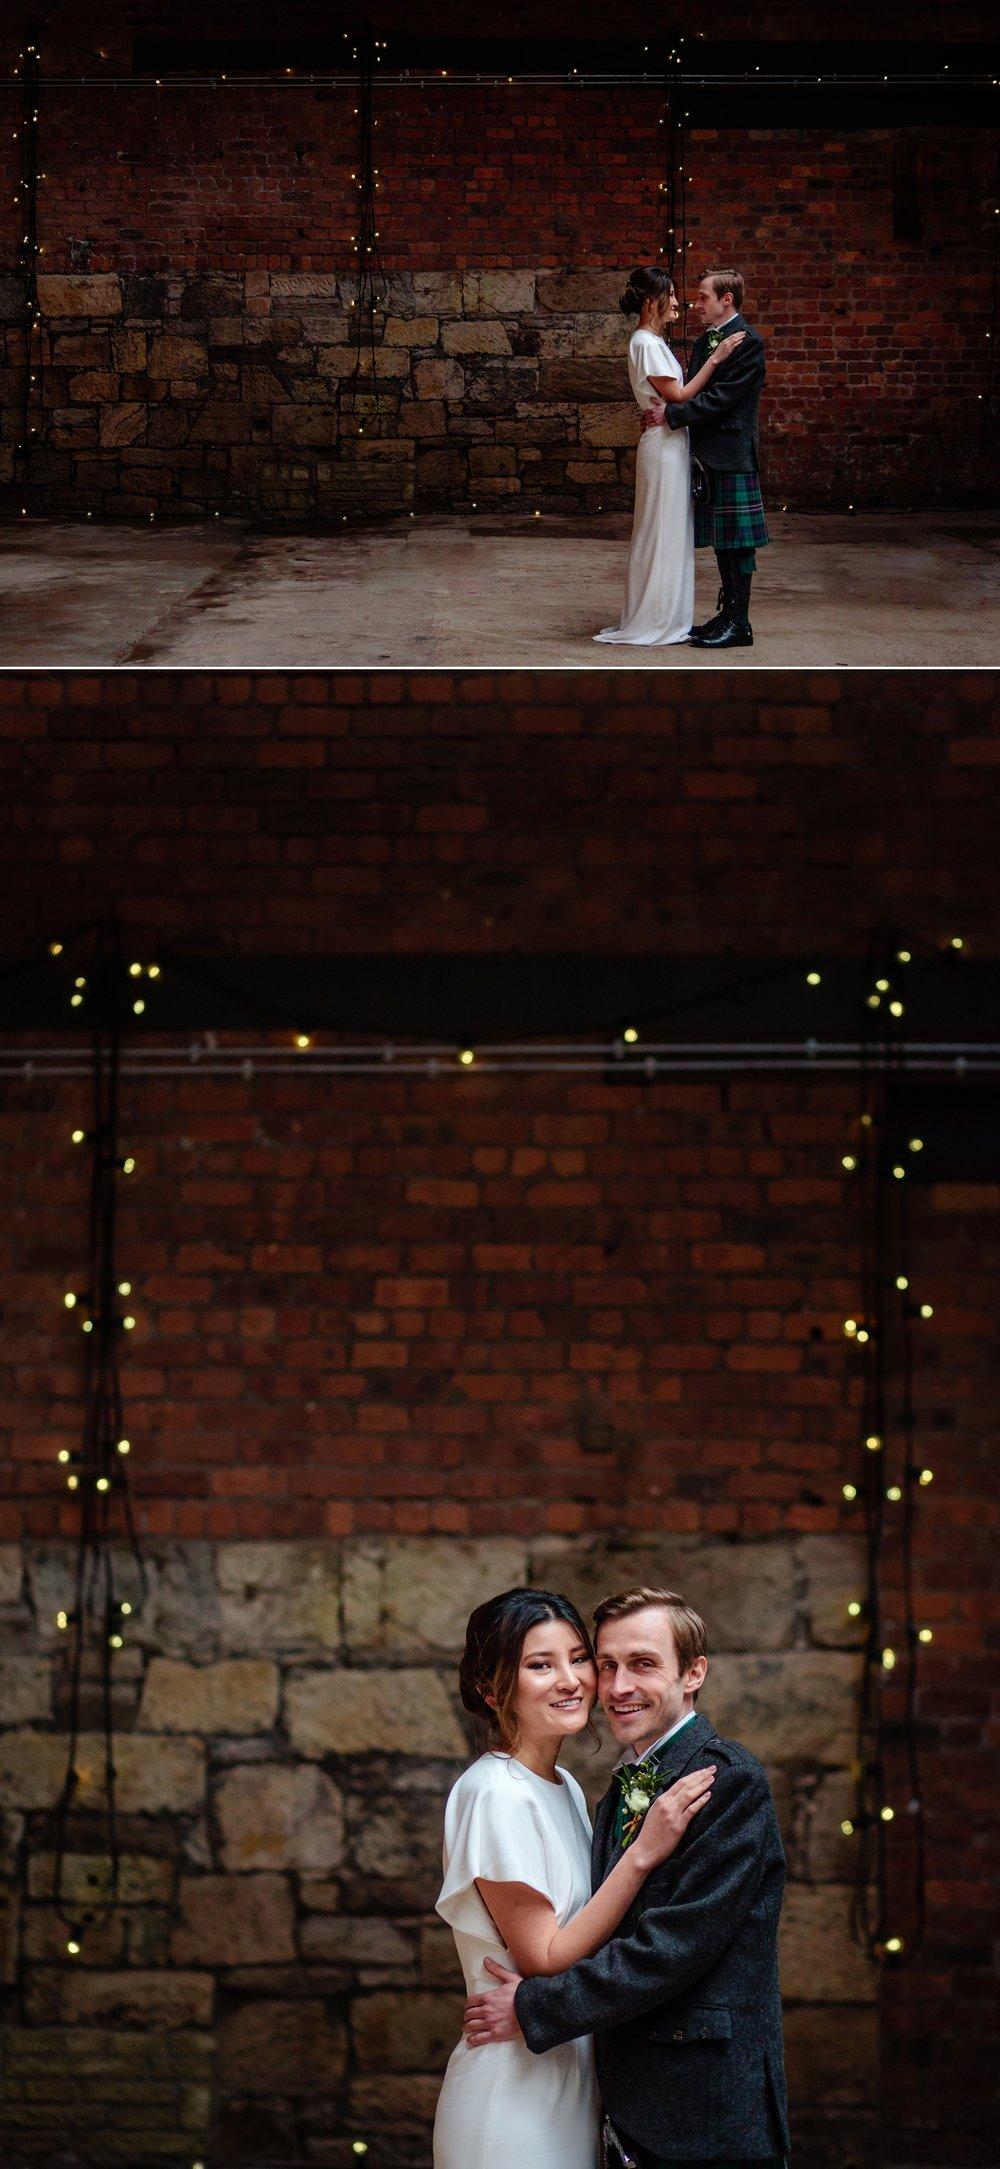 engine-works-wedding-styled-shoot-fotomaki-photography-90.jpg